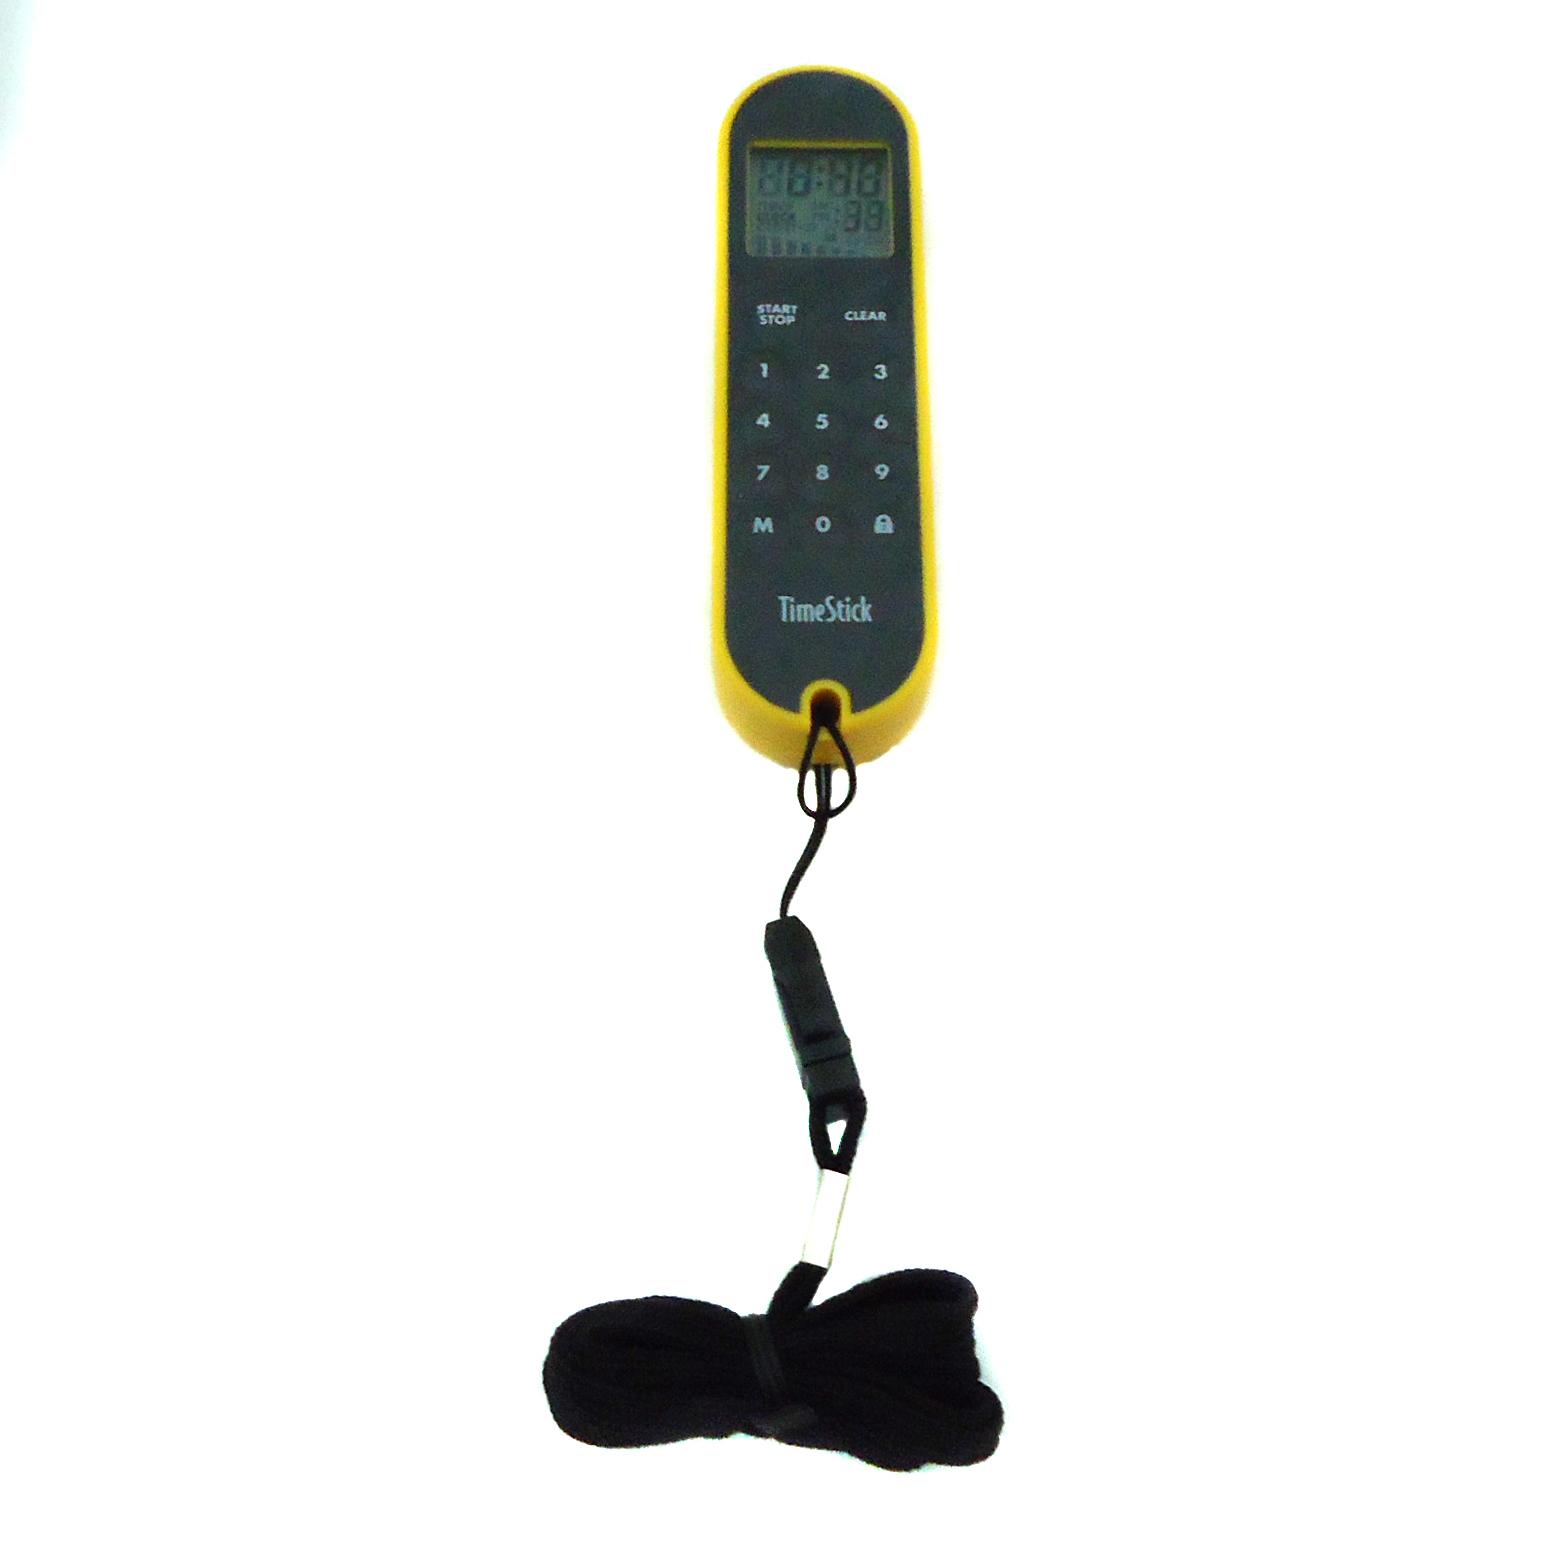 Eti 806-182 TimeStick Αδιάβροχο Χρονόμετρο - Χρώμα: Κίτρινο επαγγελματικός εξοπλισμός   επαγγελματικά σκεύη είδη σερβιρίσματος   εργαλεία κο